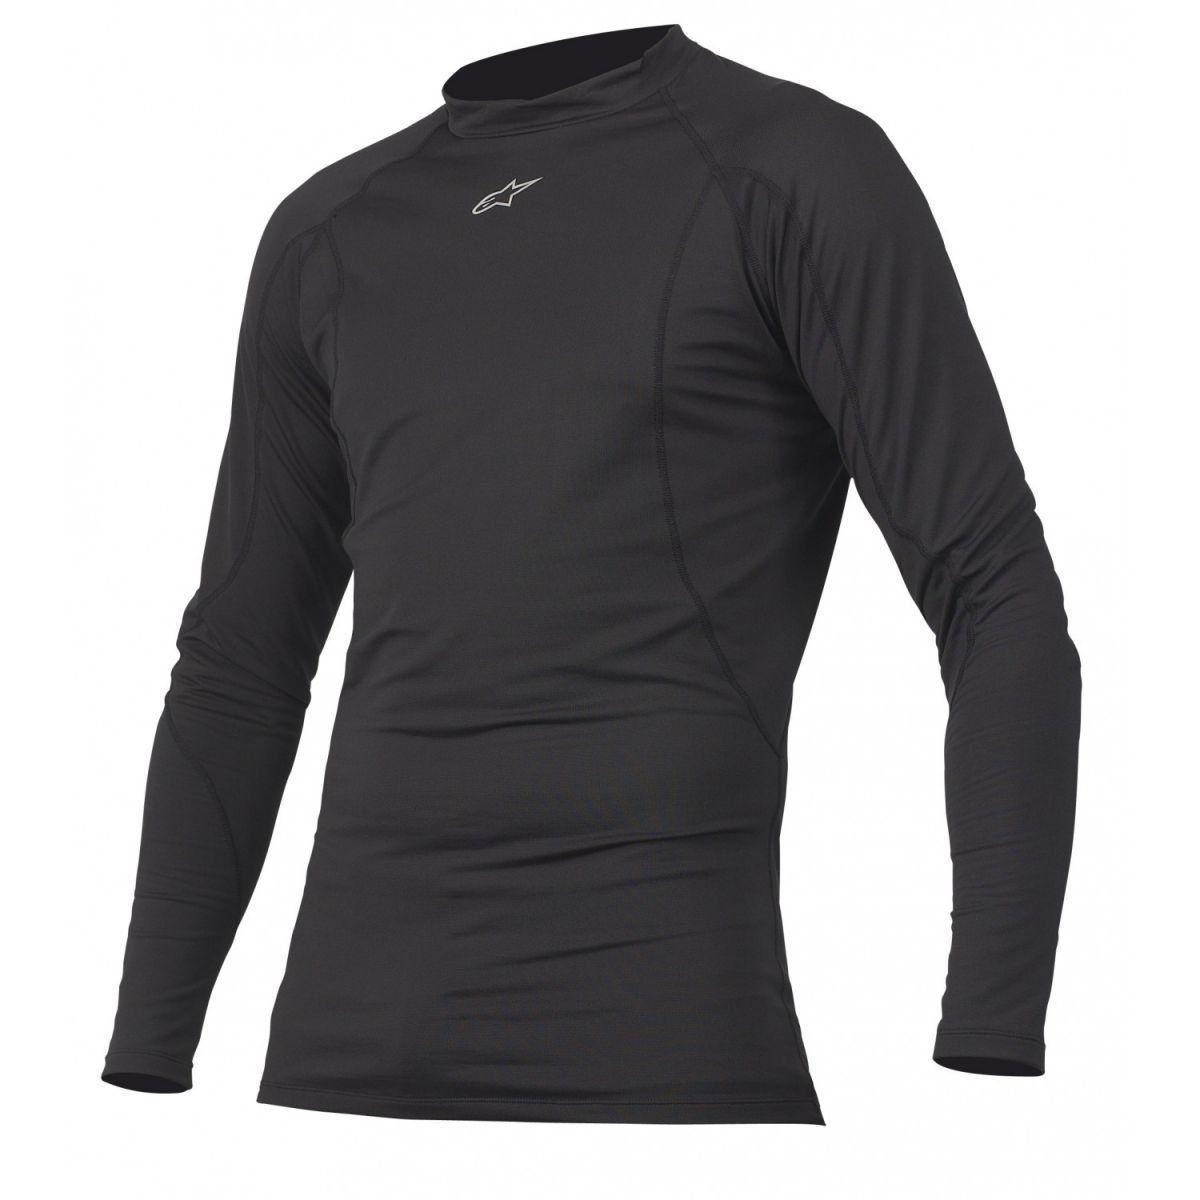 Camiseta Alpinestars Thermal Tech Top